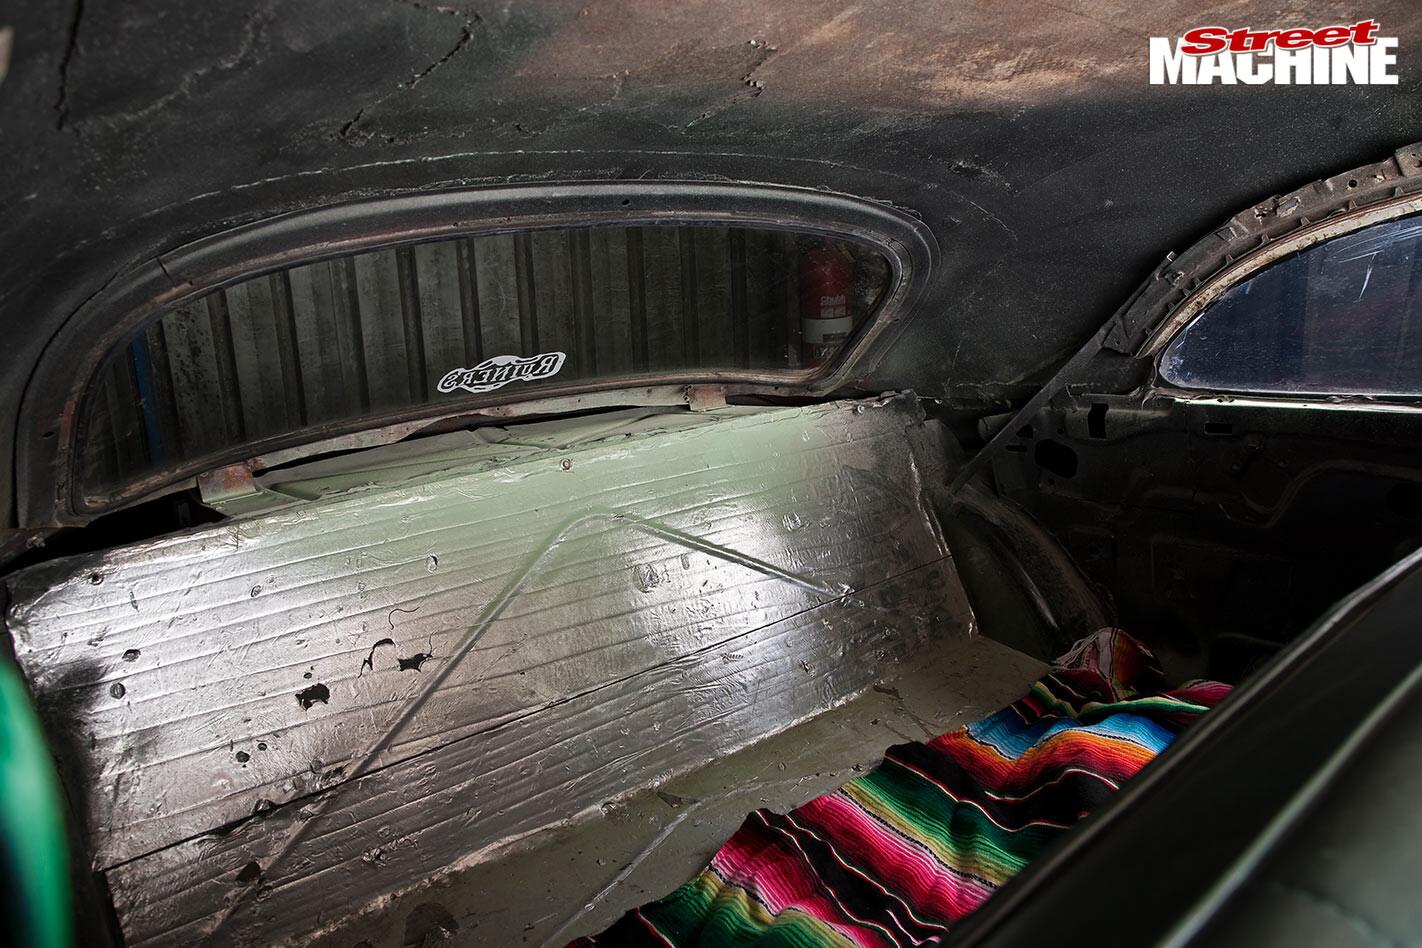 Chev sedan interior rear